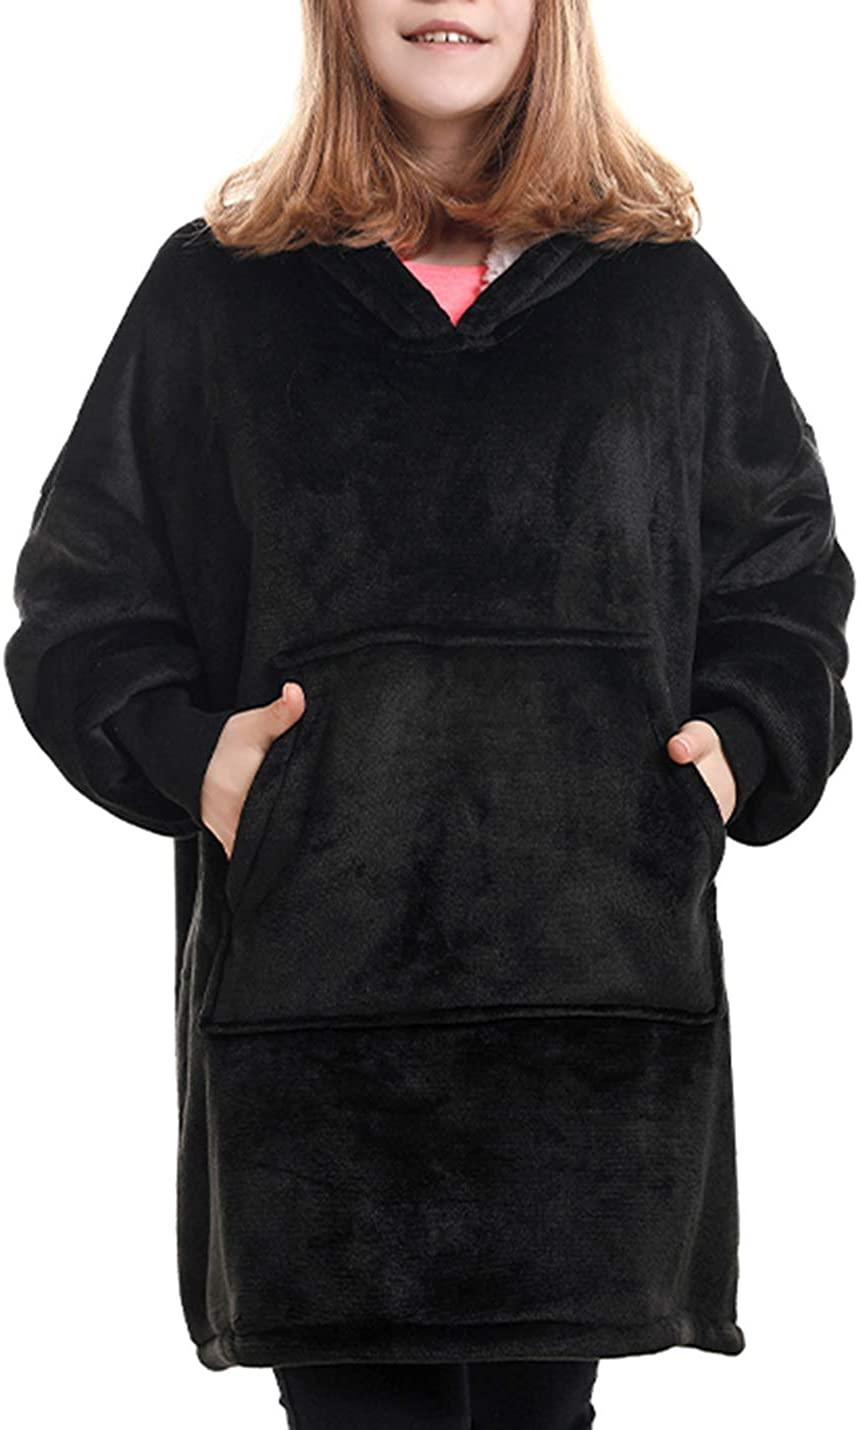 Hooever Girls Casual Wearable Blanket Sherpa Fleece Lined Flannel Hoodie Sweatshirts